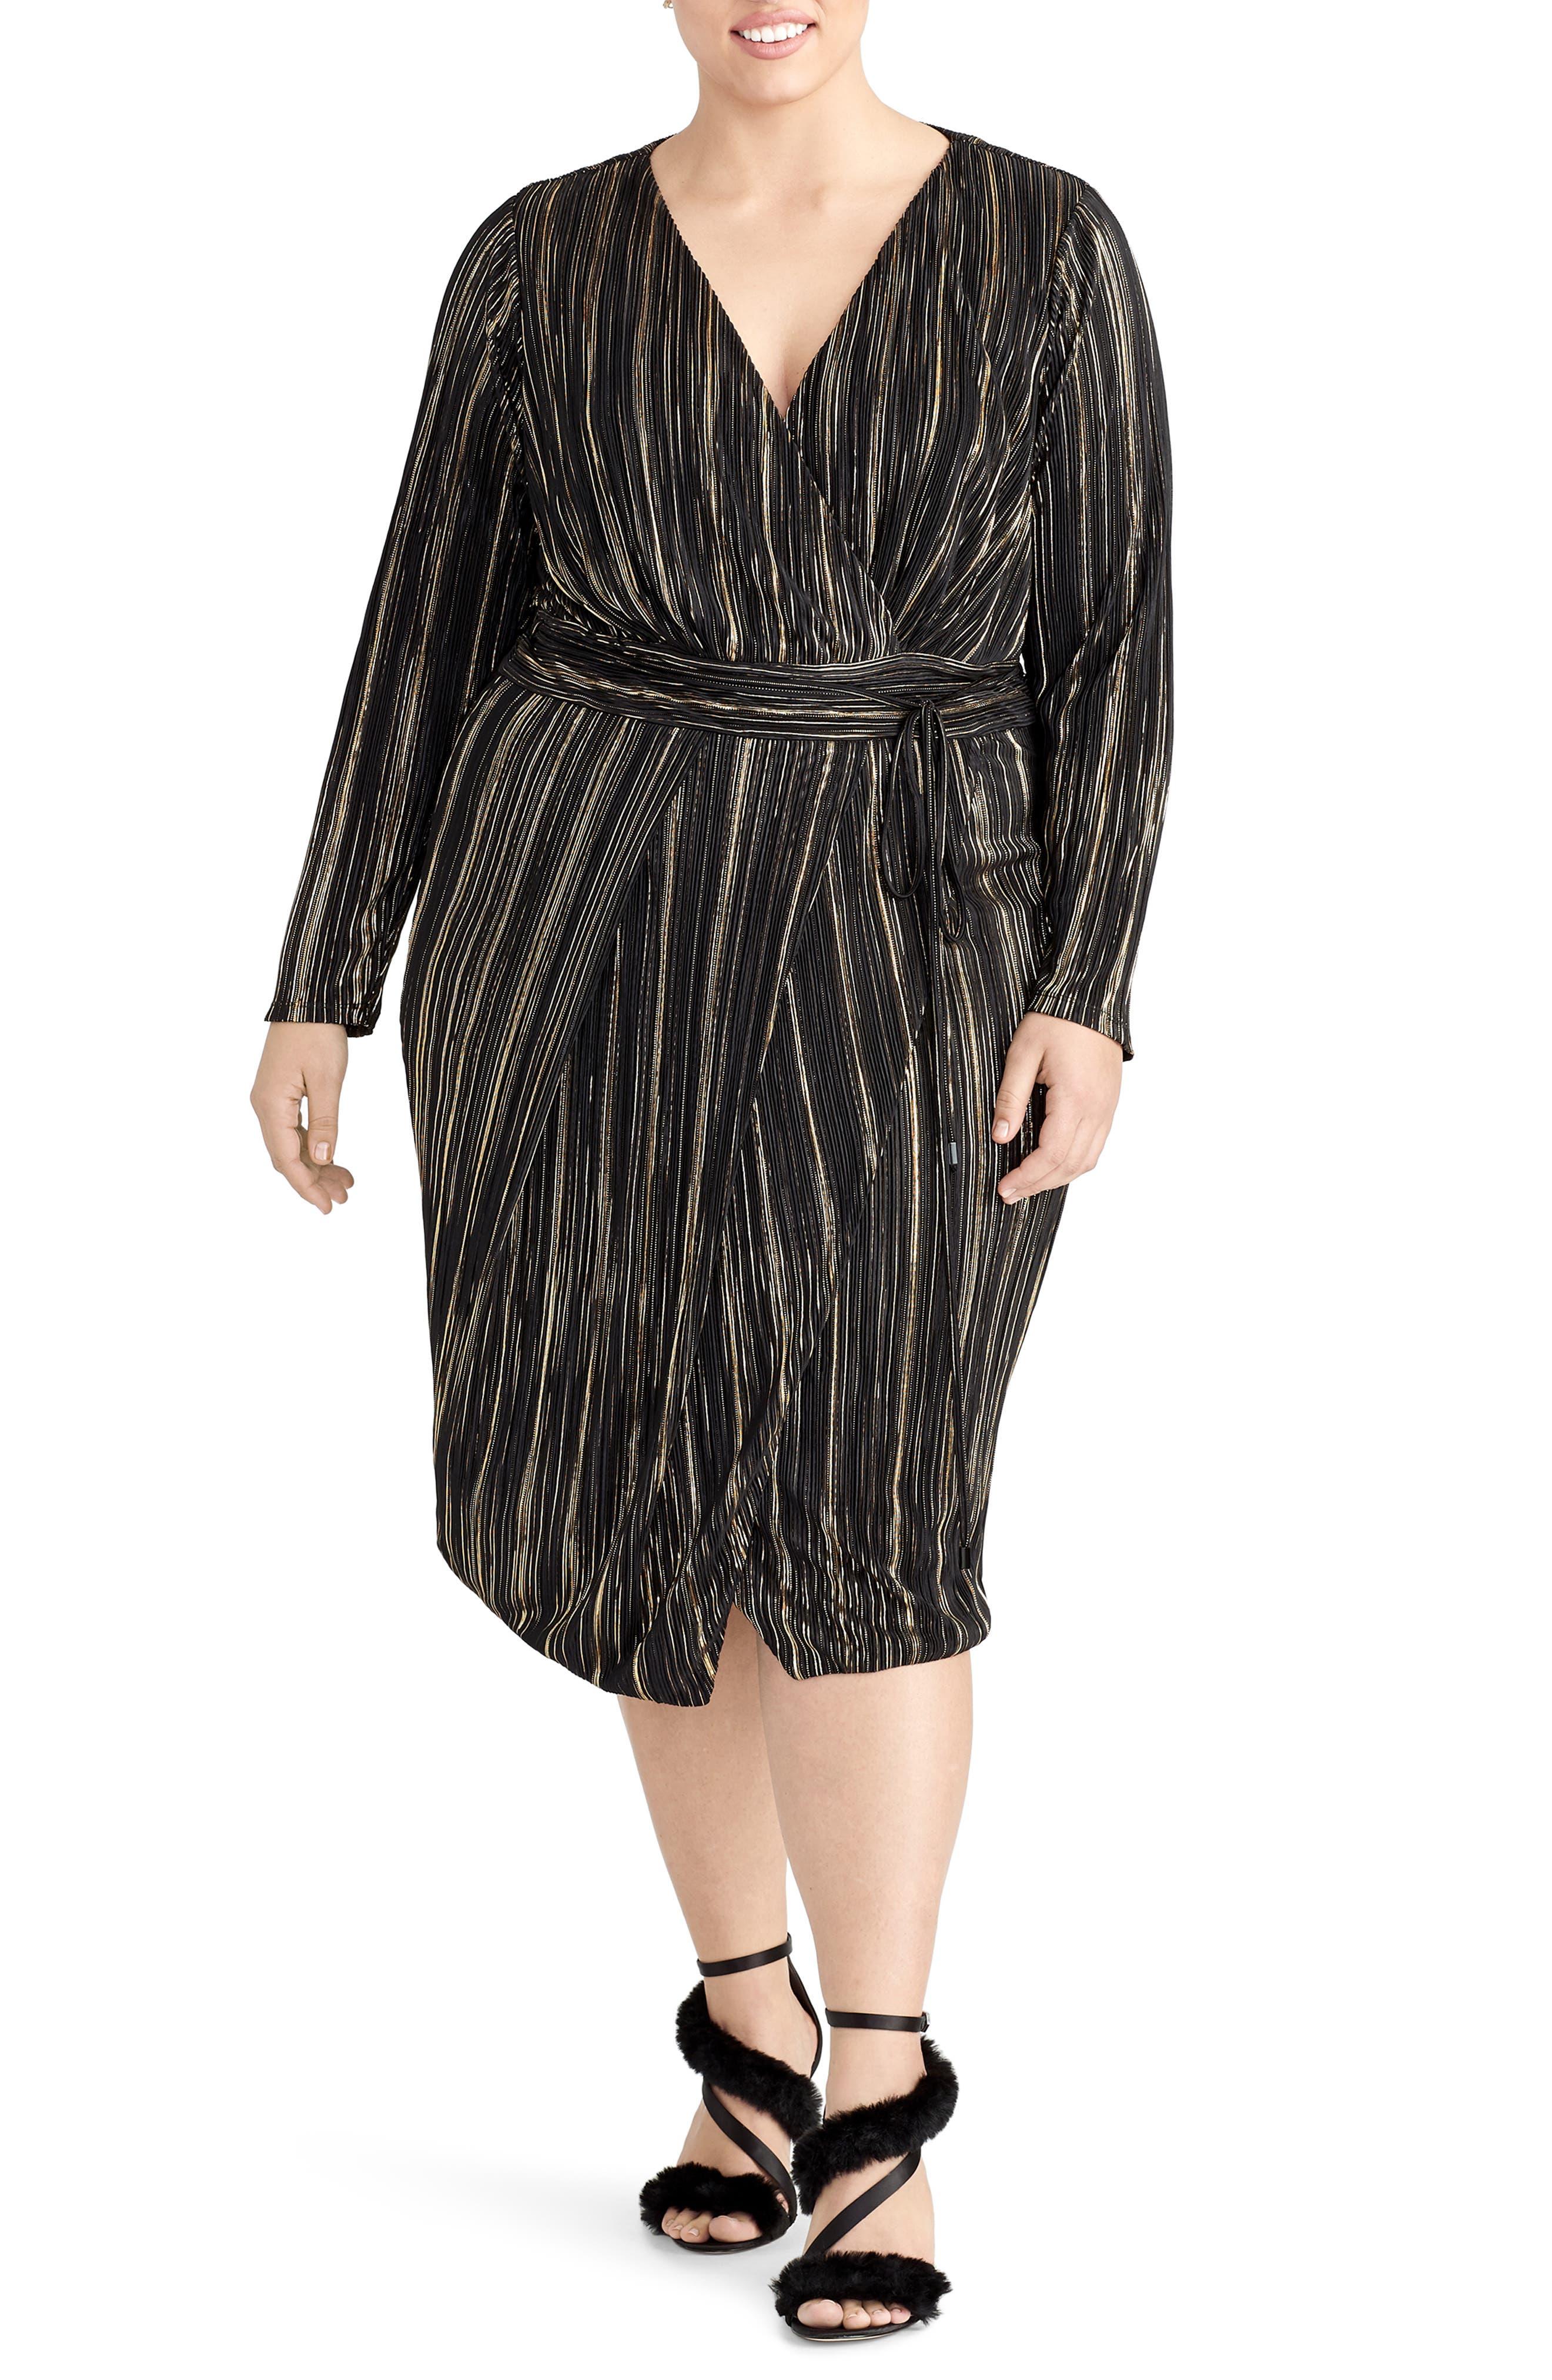 Plus Size Rachel Rachel Roy Kaia Faux Wrap Metallic Dress